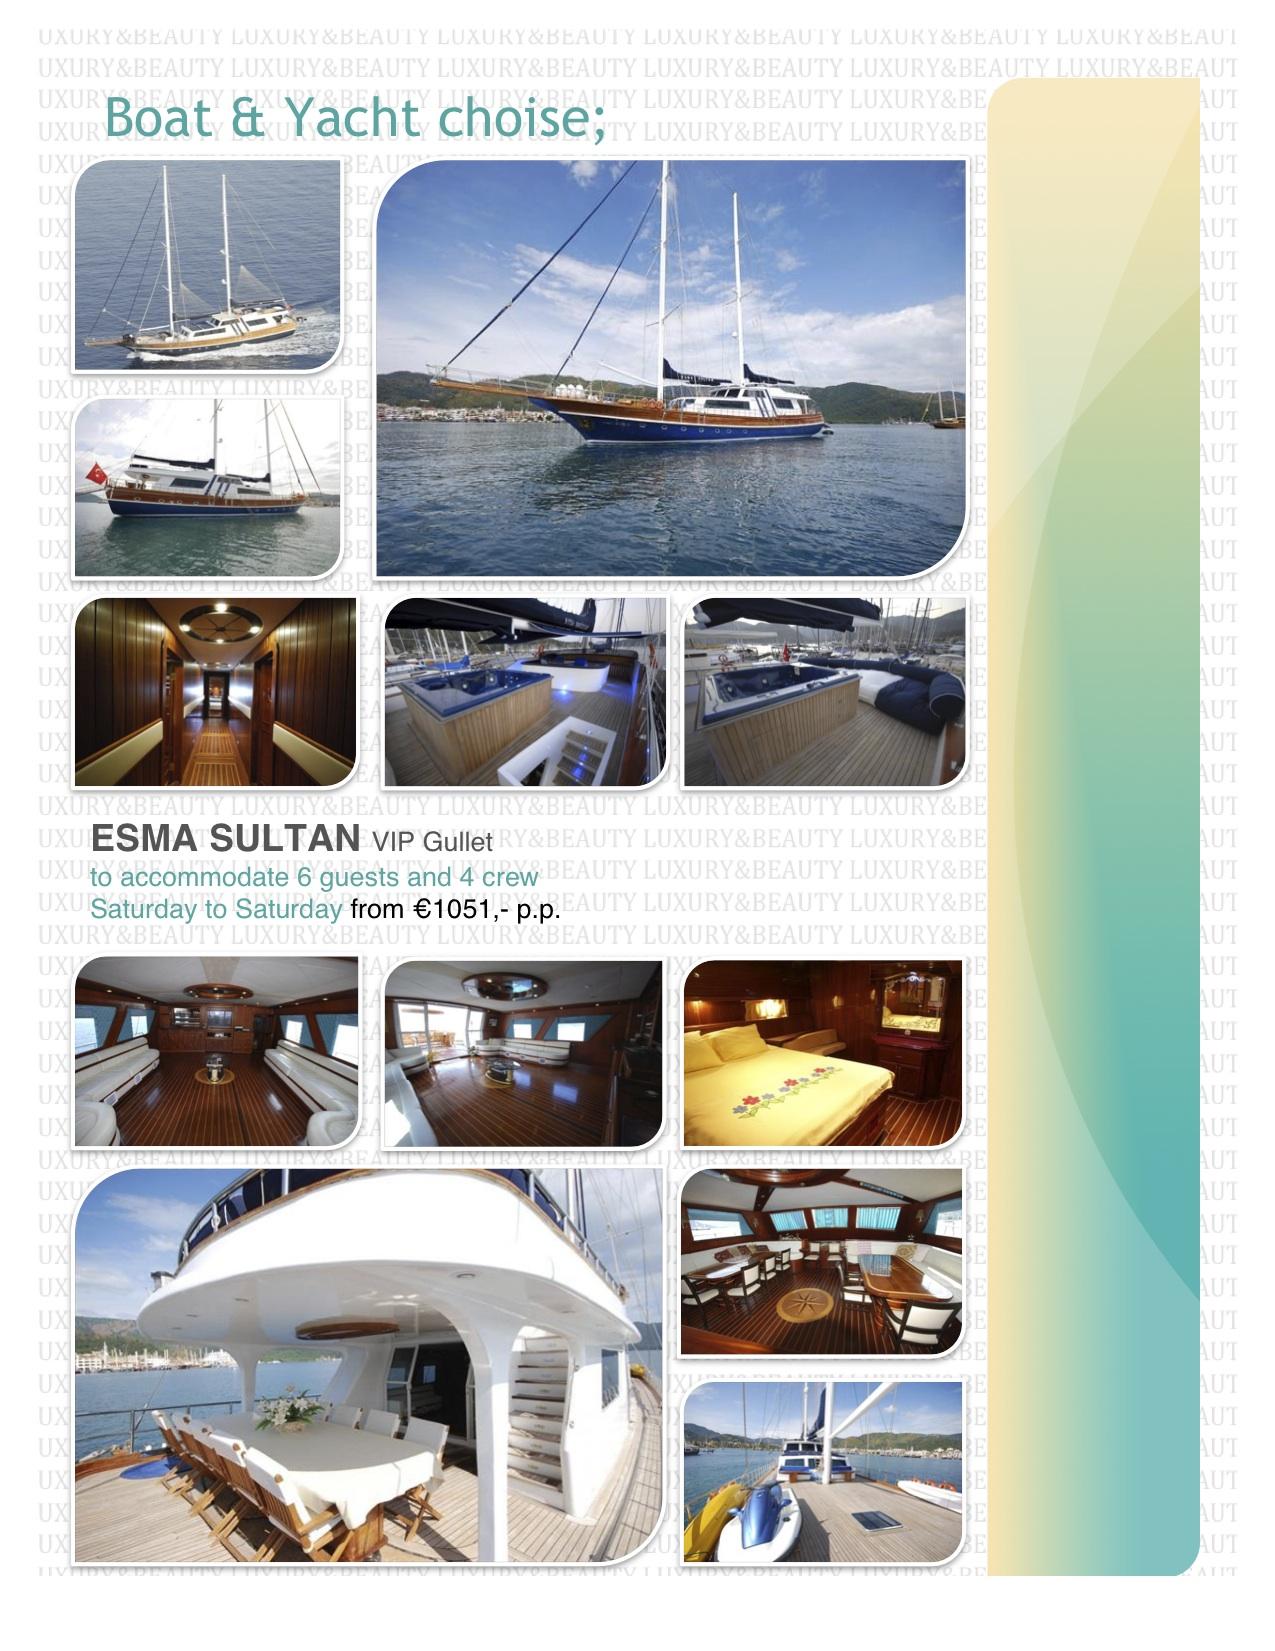 Luxury&Beauty_Yoga_Yacht.jpg13